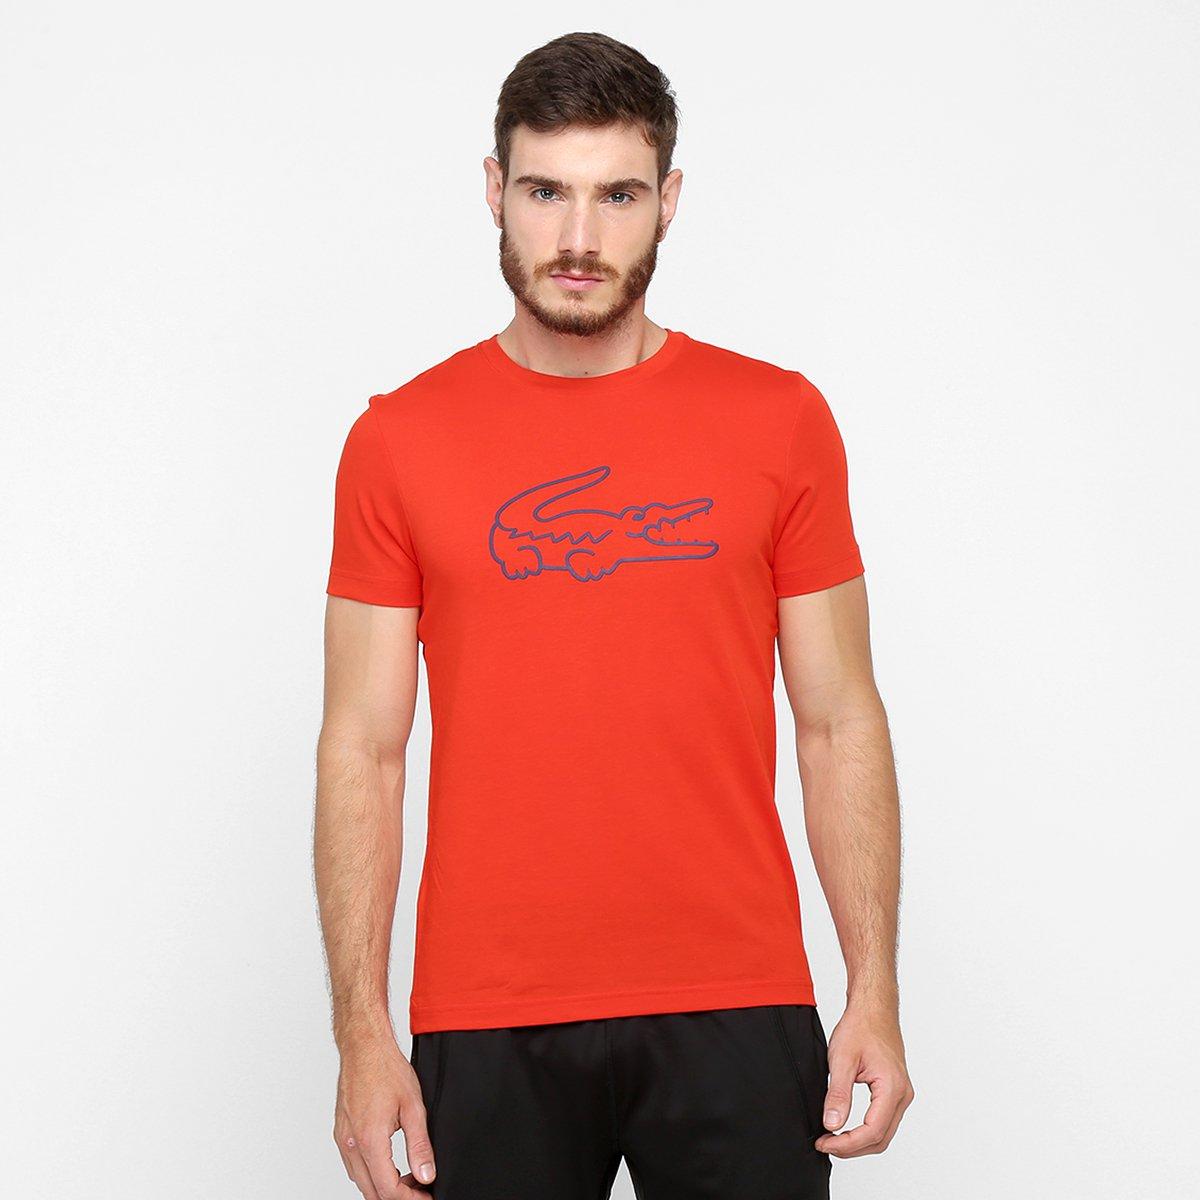 27b5c7b0d54 Camiseta Lacoste - Compre Agora